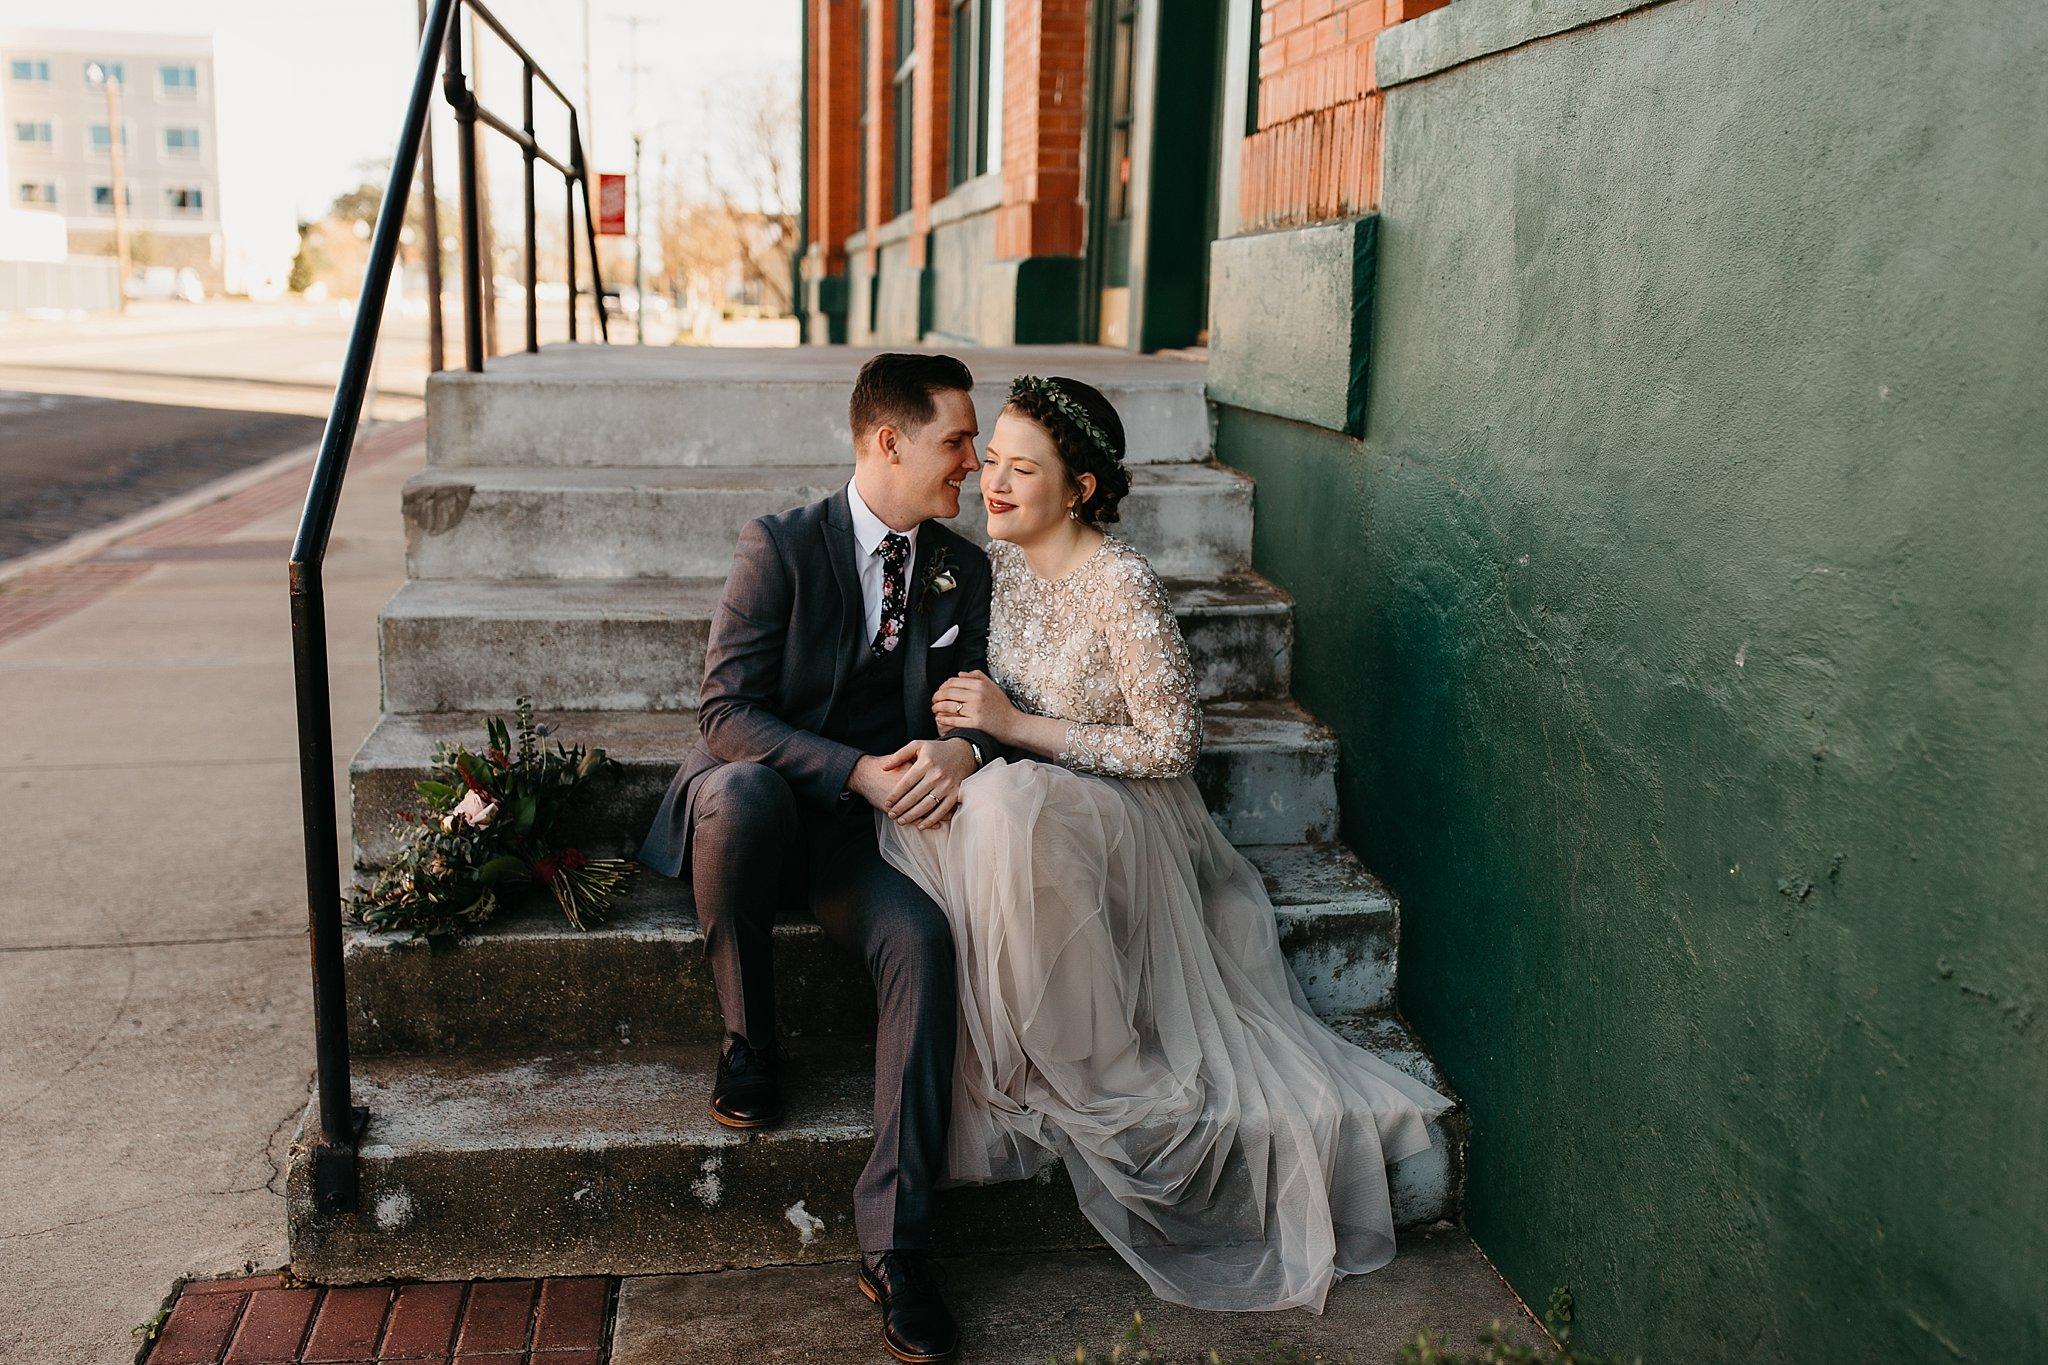 Wilderlove Co_Waco Texas_The Phoenix_Romantic Wedding Photography_0036.jpg